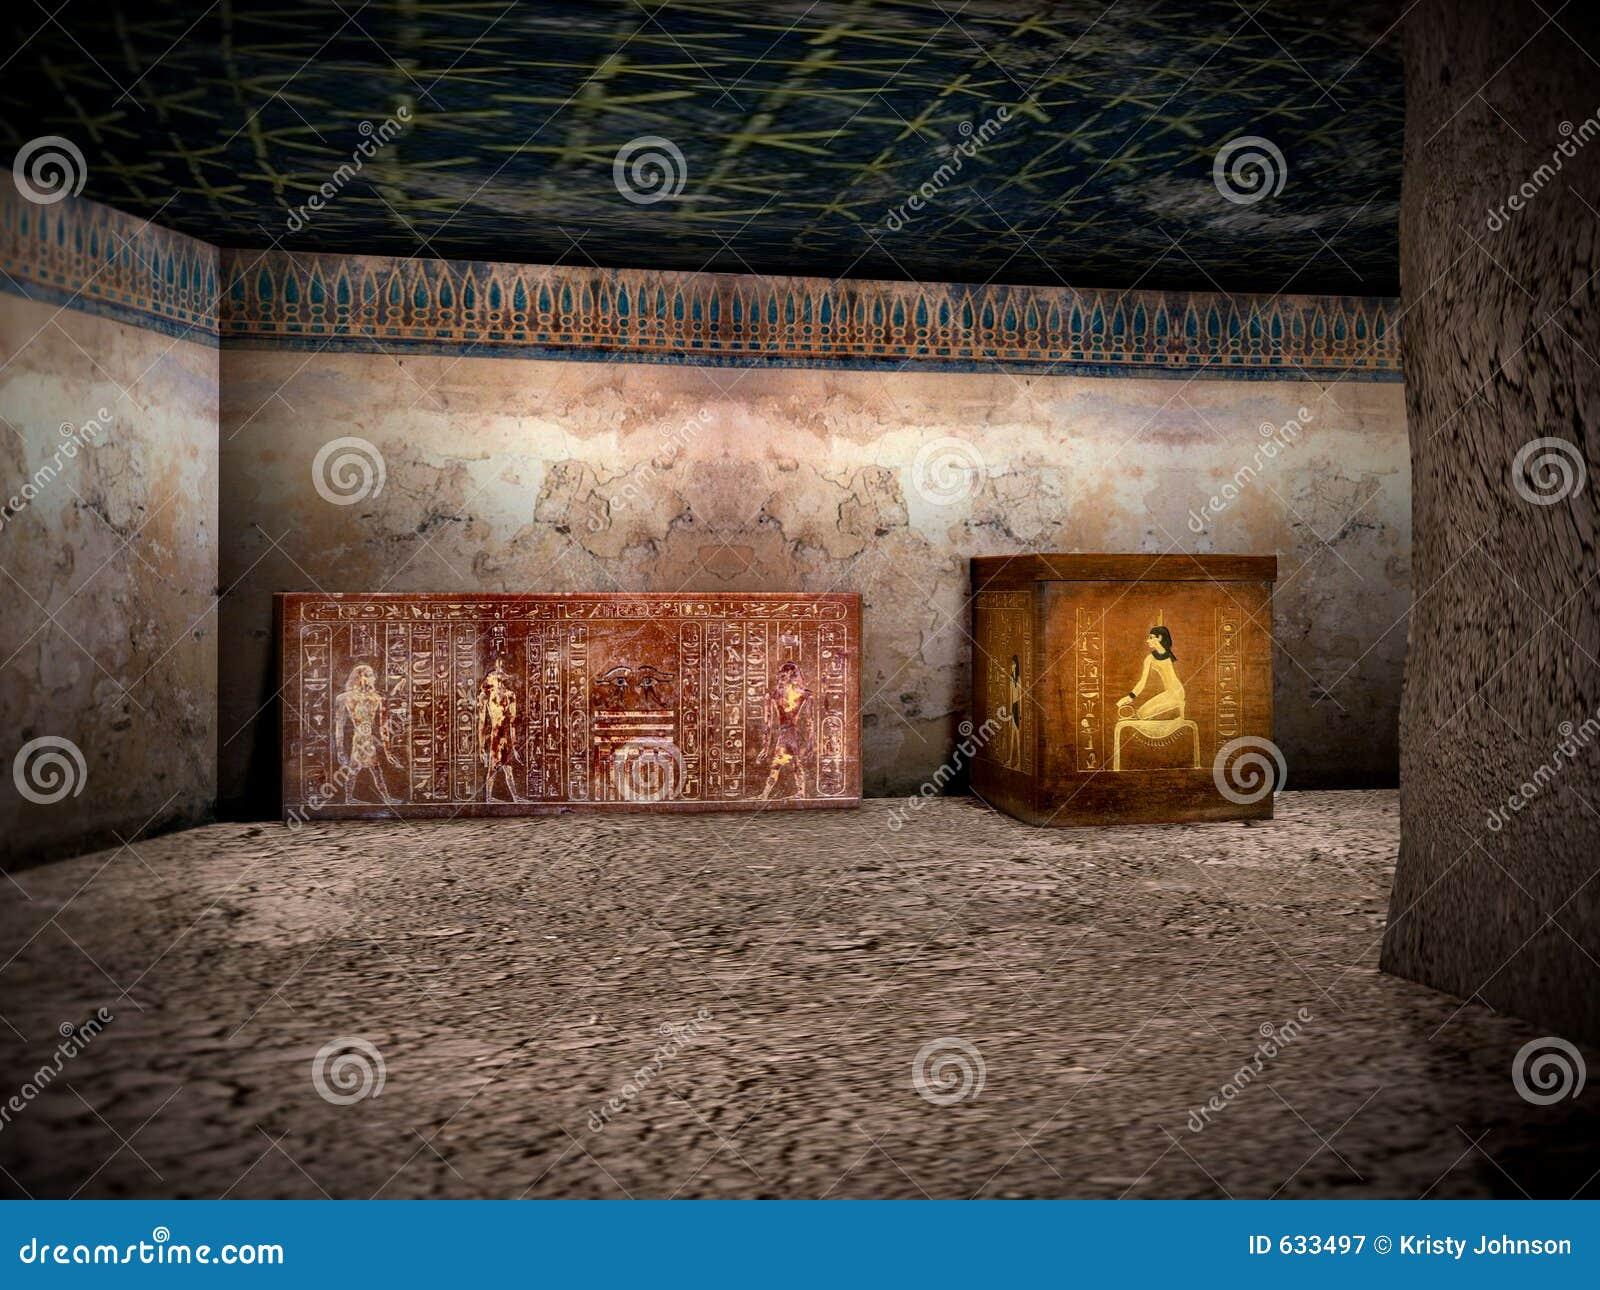 2 egypt tombs